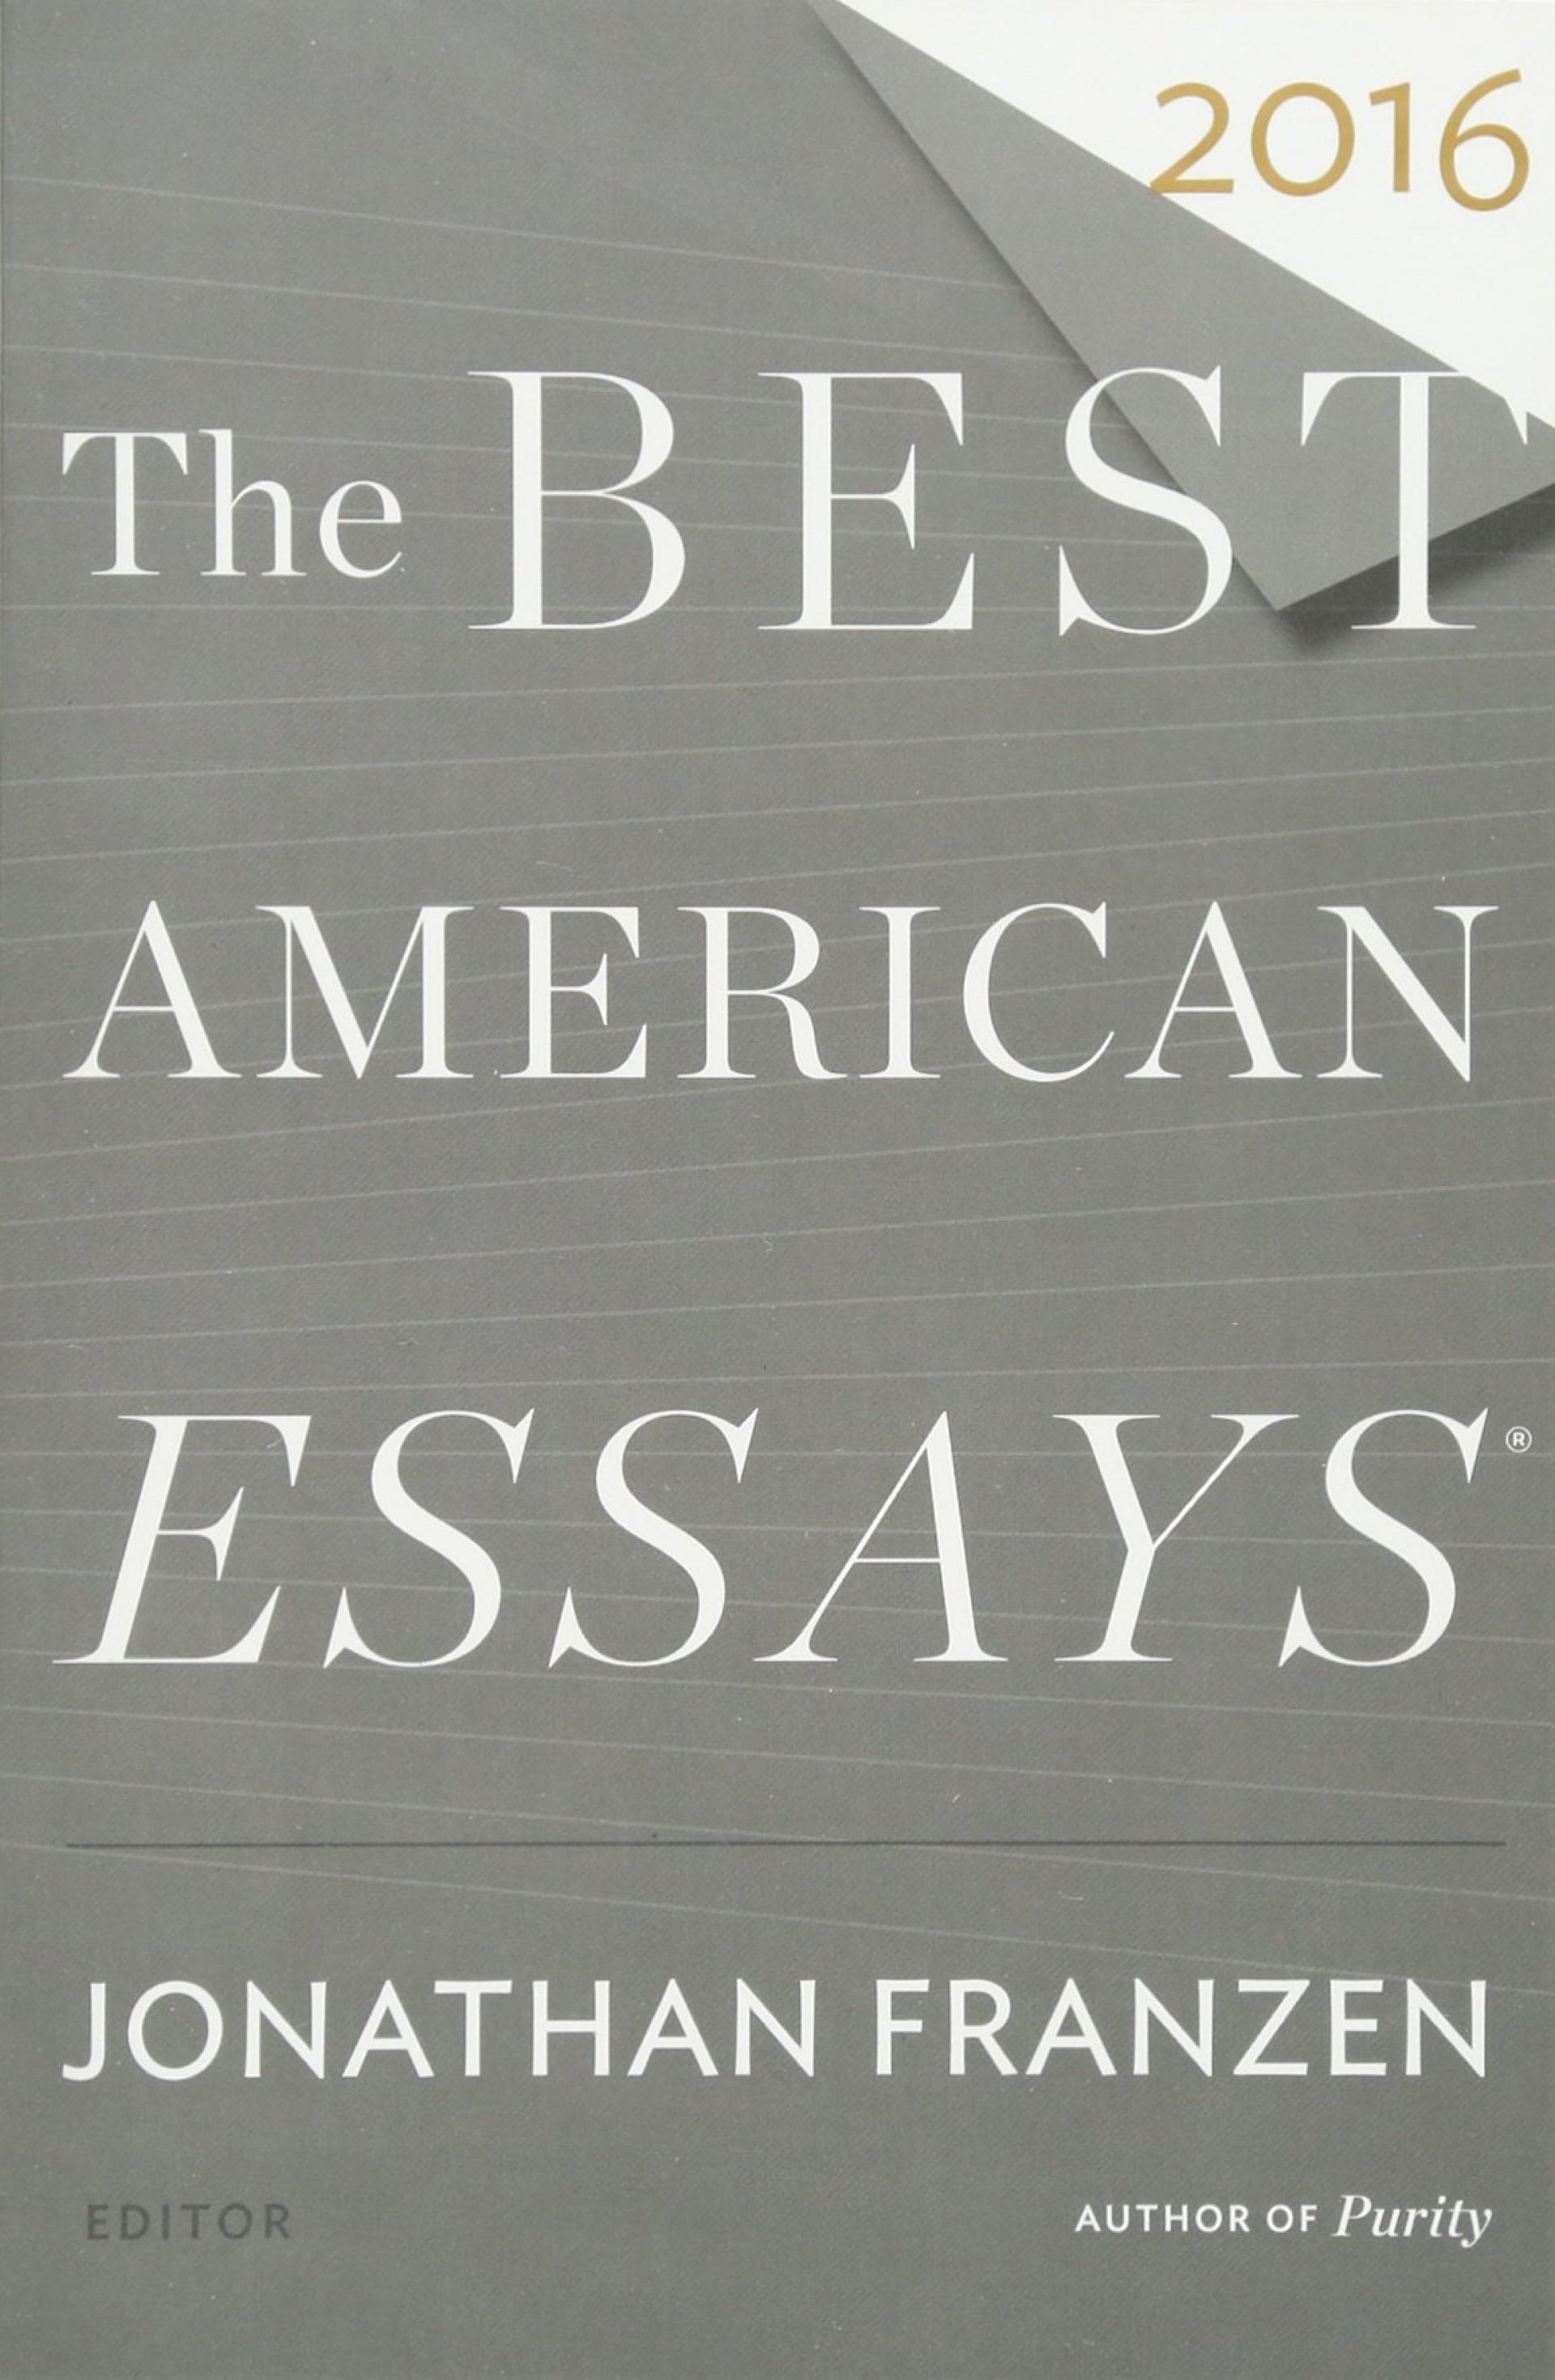 001 71a6bhsgsdl Essay Example Best Essays Breathtaking 2016 Personal College Australian 1920